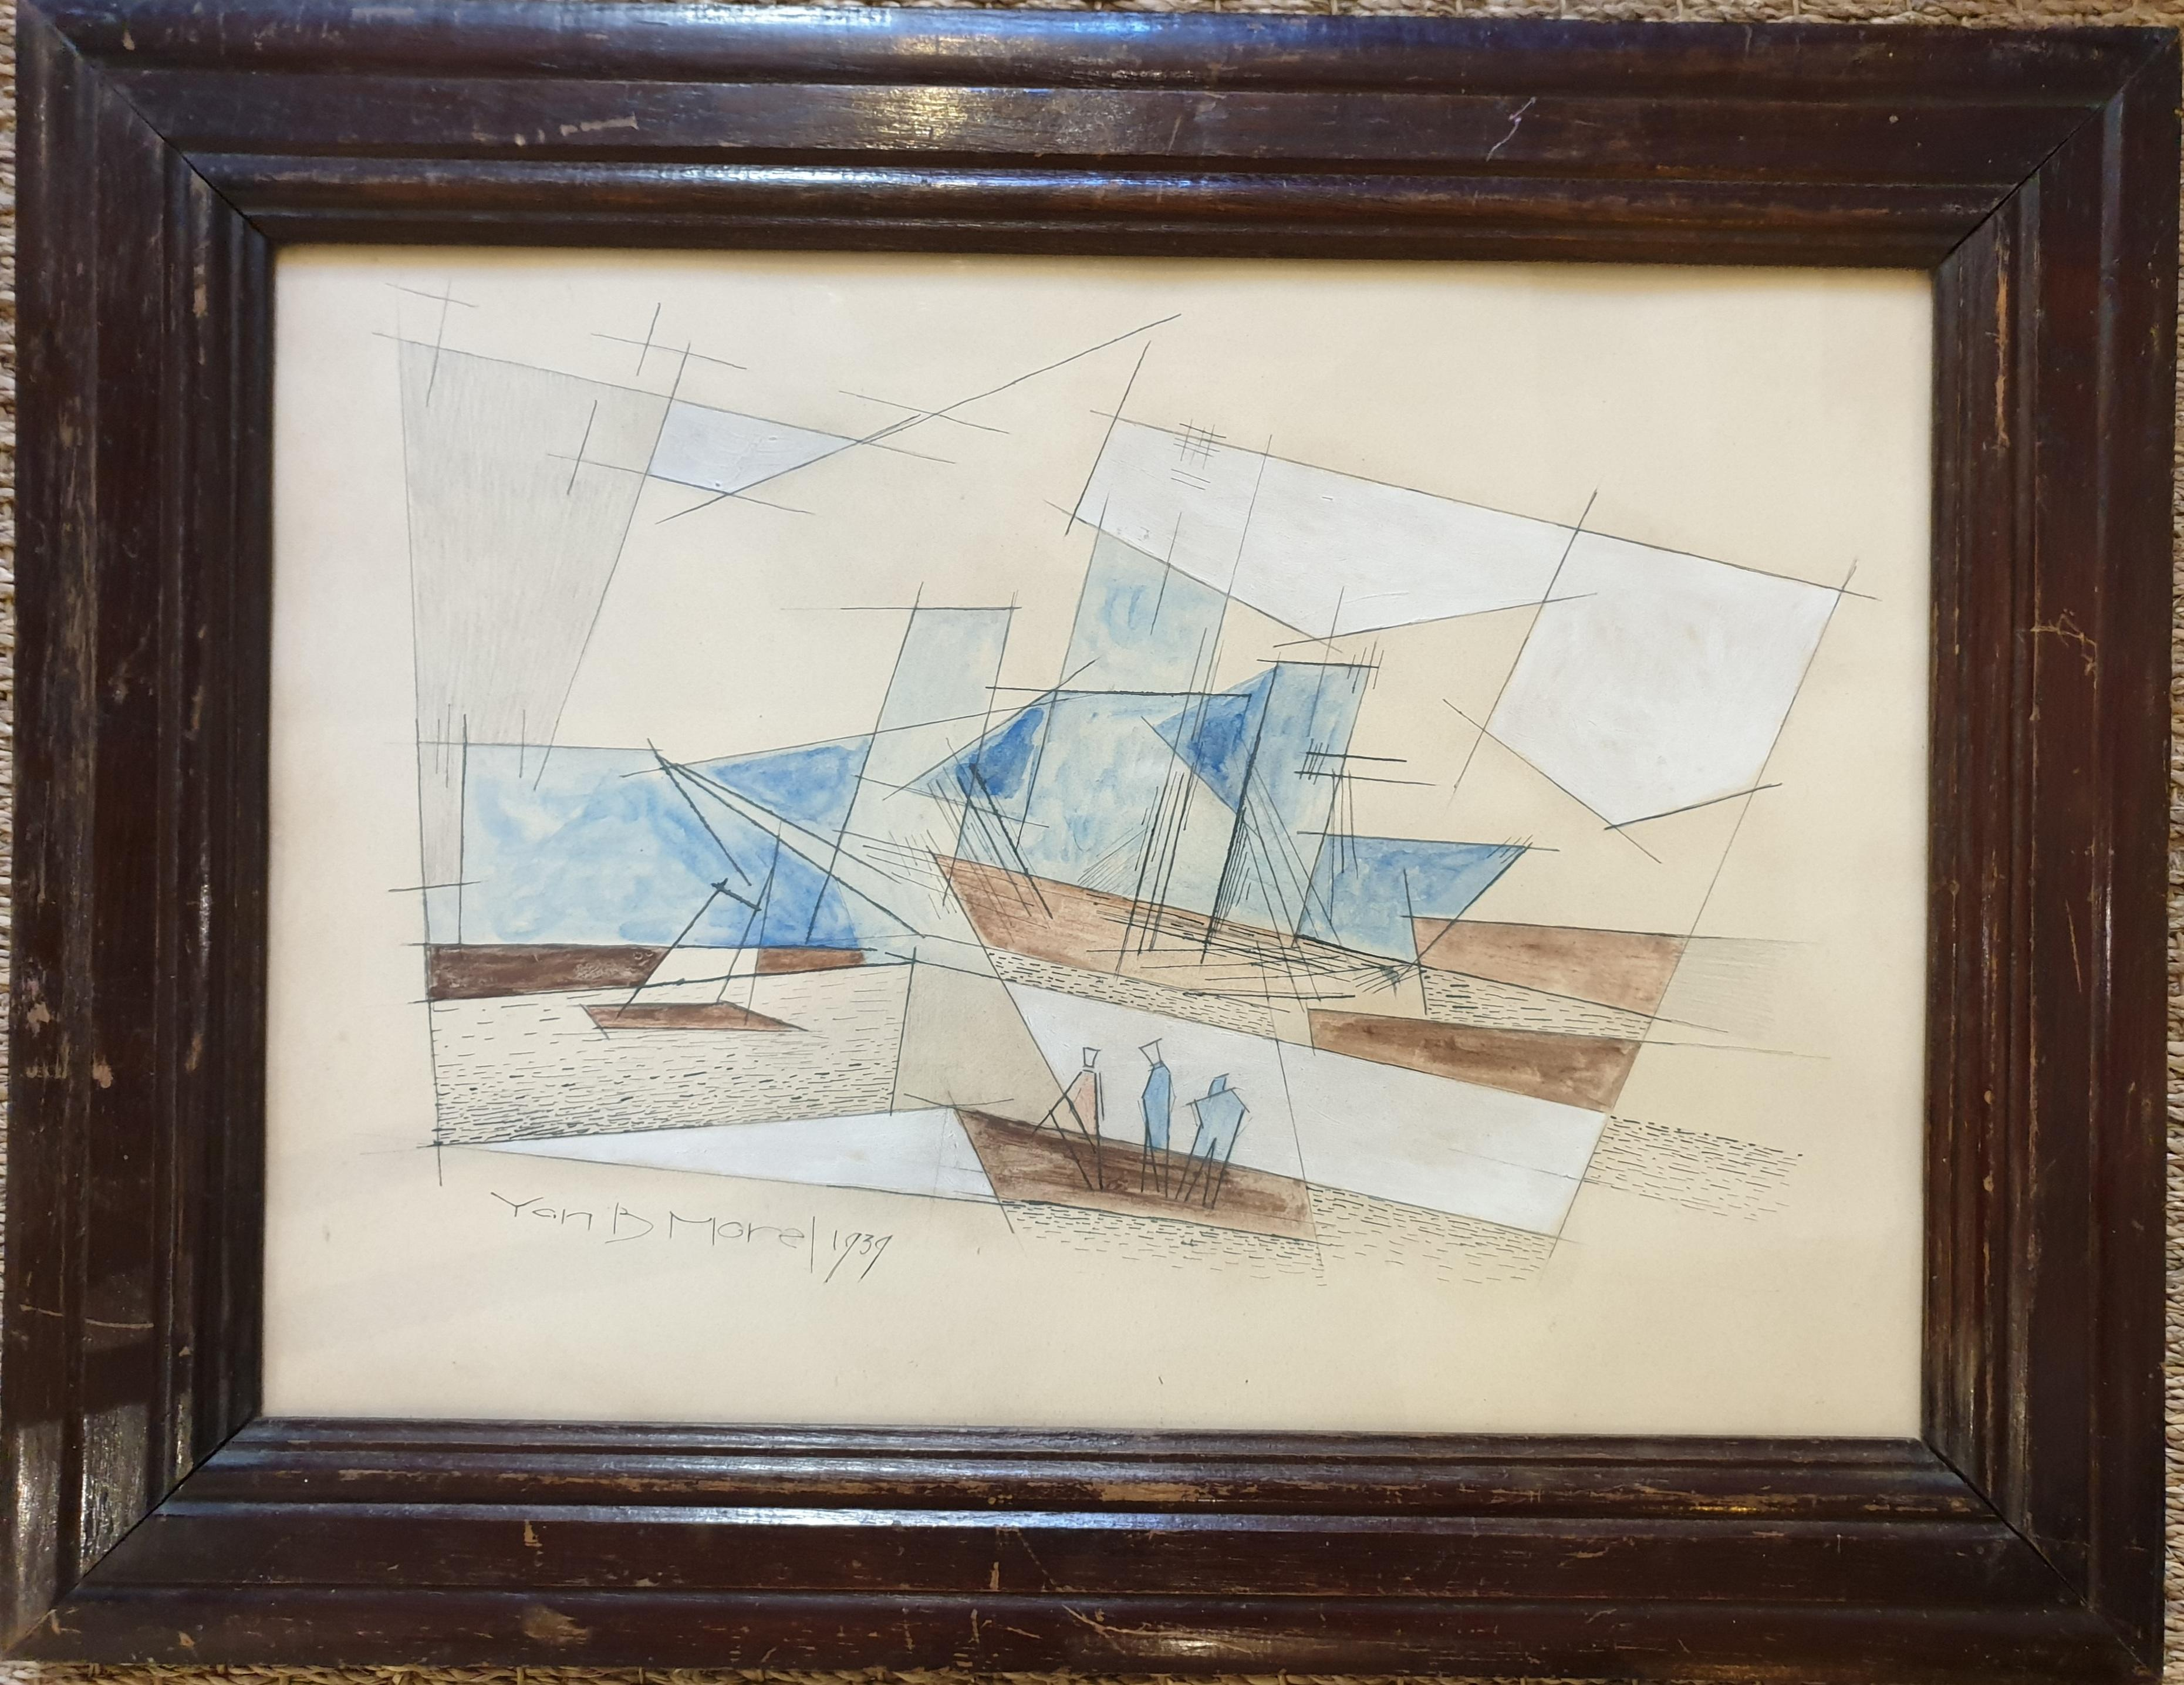 Late Art Deco Period Cubist Nautical Harbour Scene